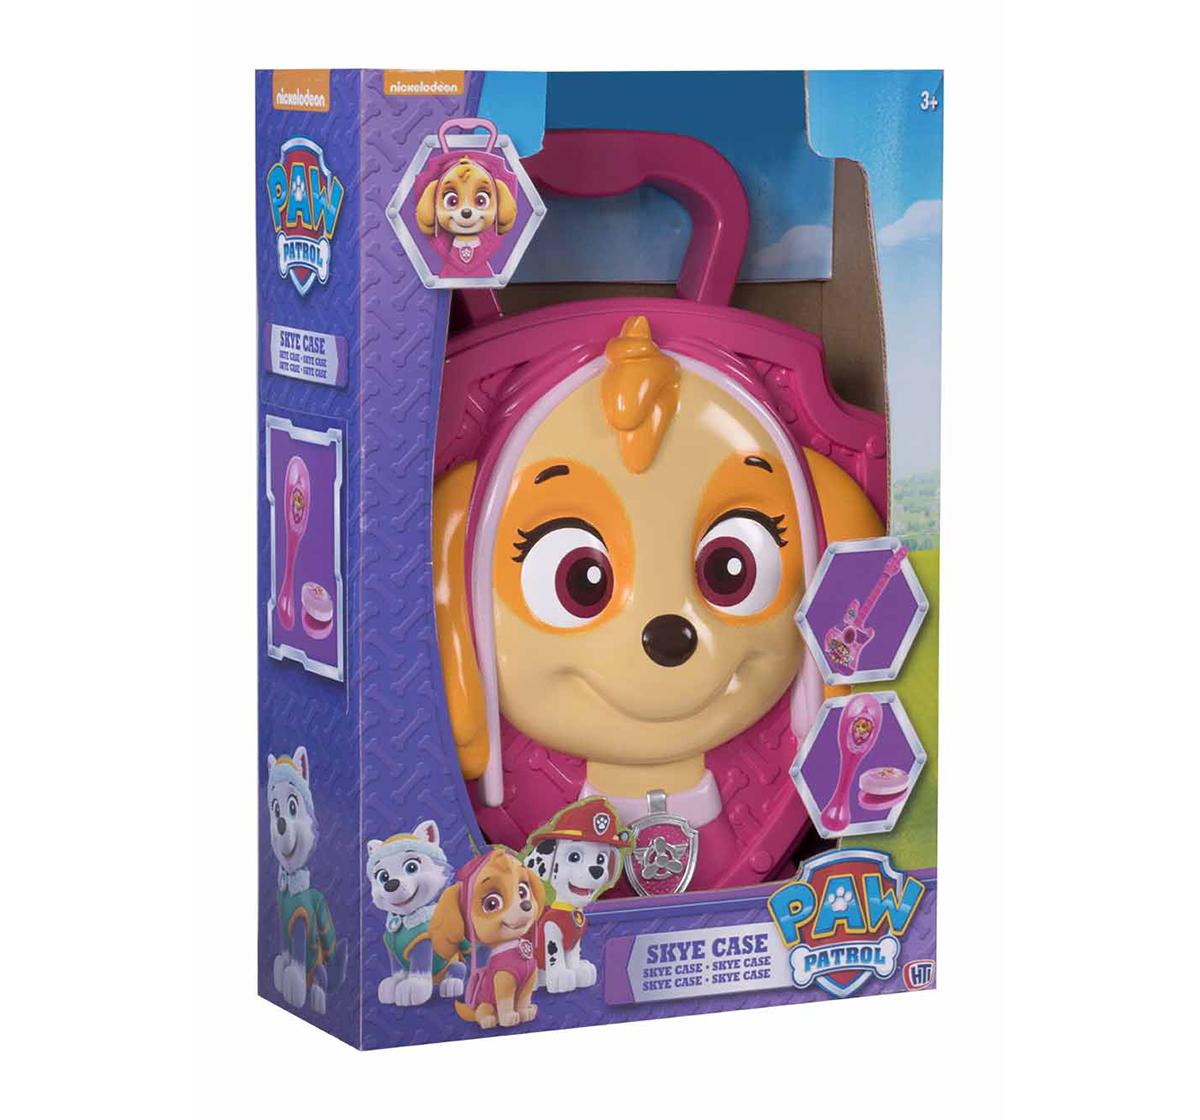 Paw Patrol   Paw Patrol Chase Case Impulse Toys for Boys age 3Y+